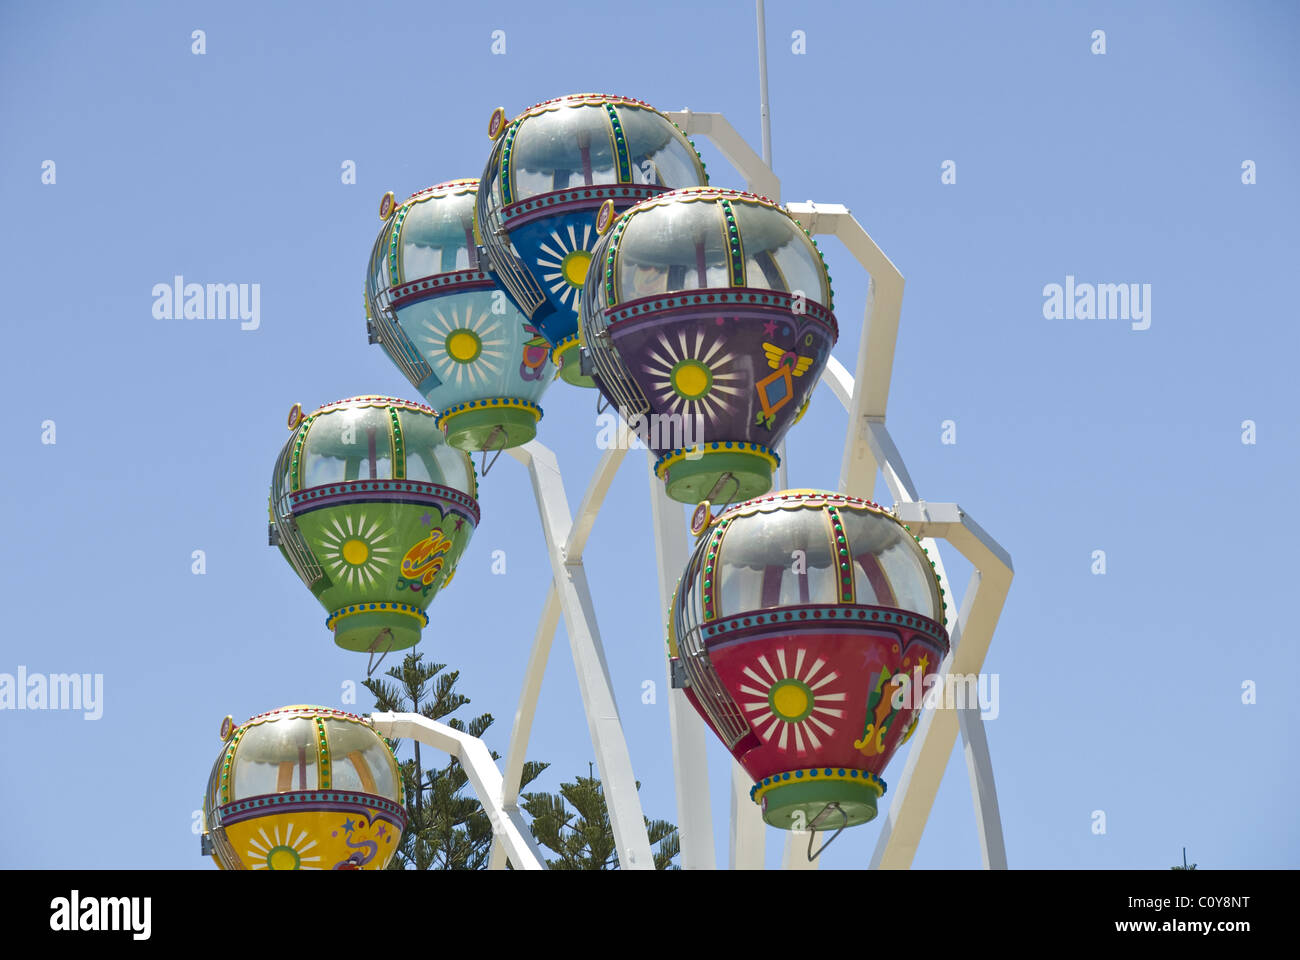 Colorful small ferris wheel Amusement park in Glenelg a suburb of Adelaide, South Australia - Stock Image